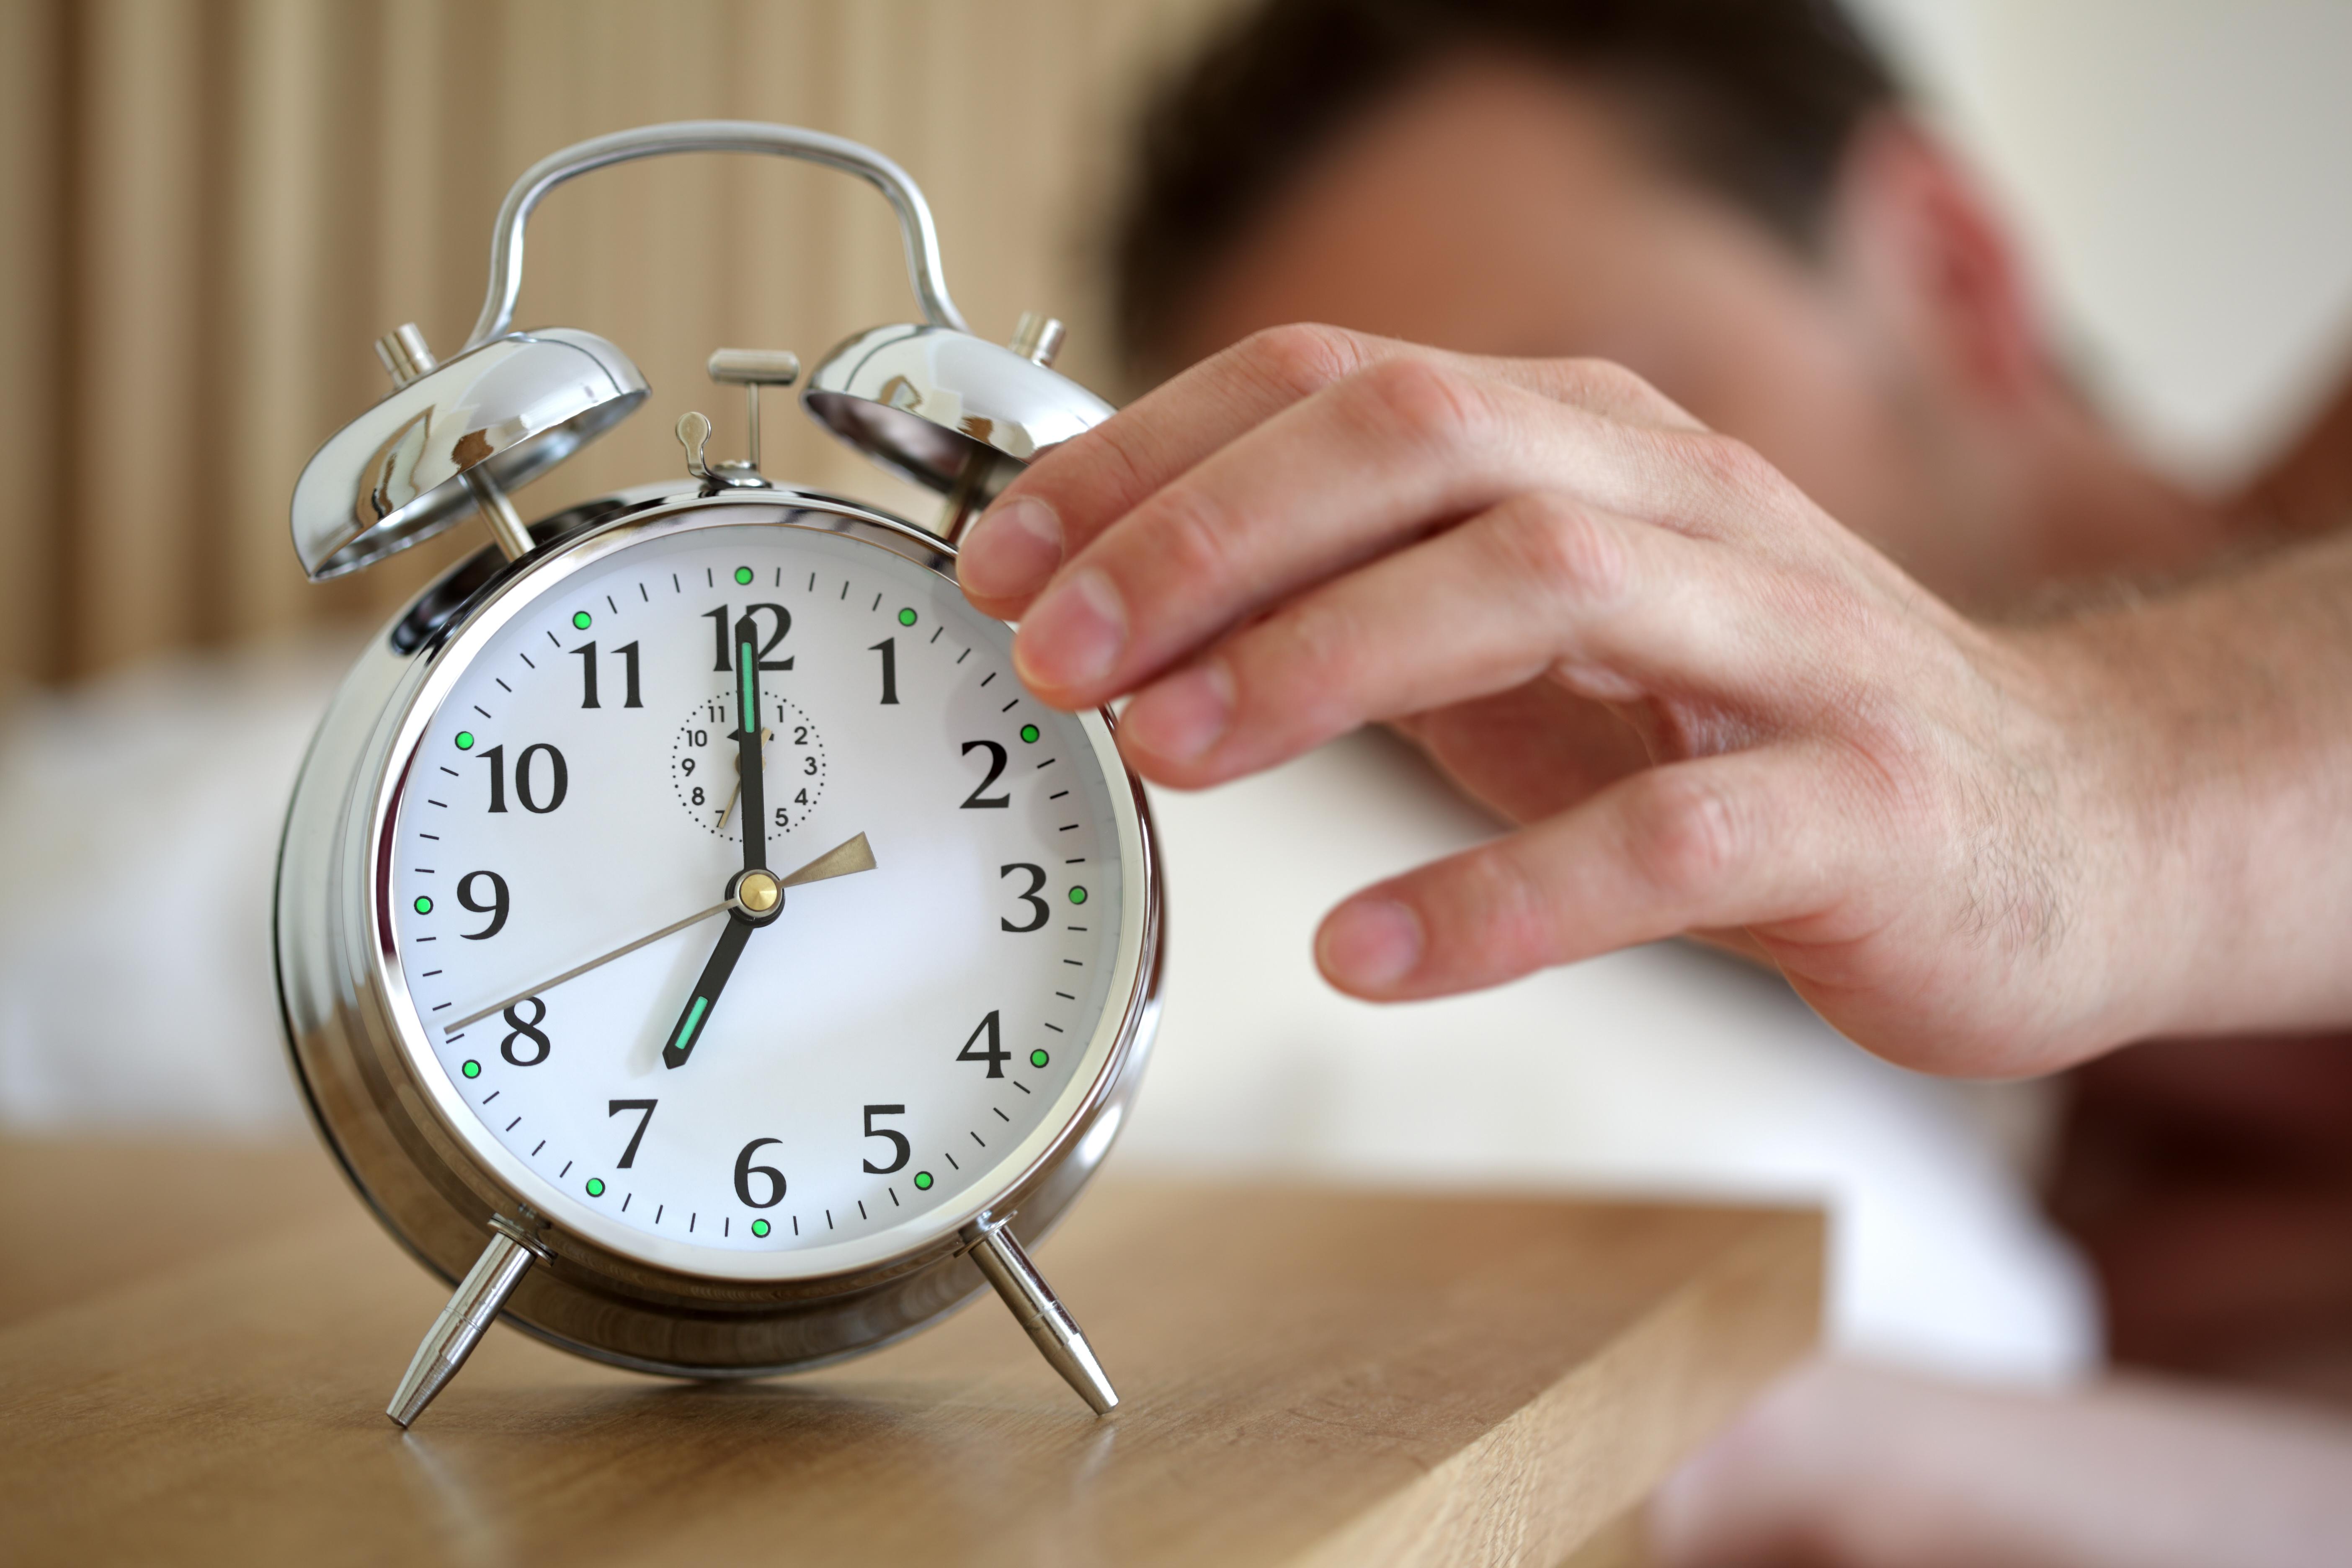 Turning off an alarm clock